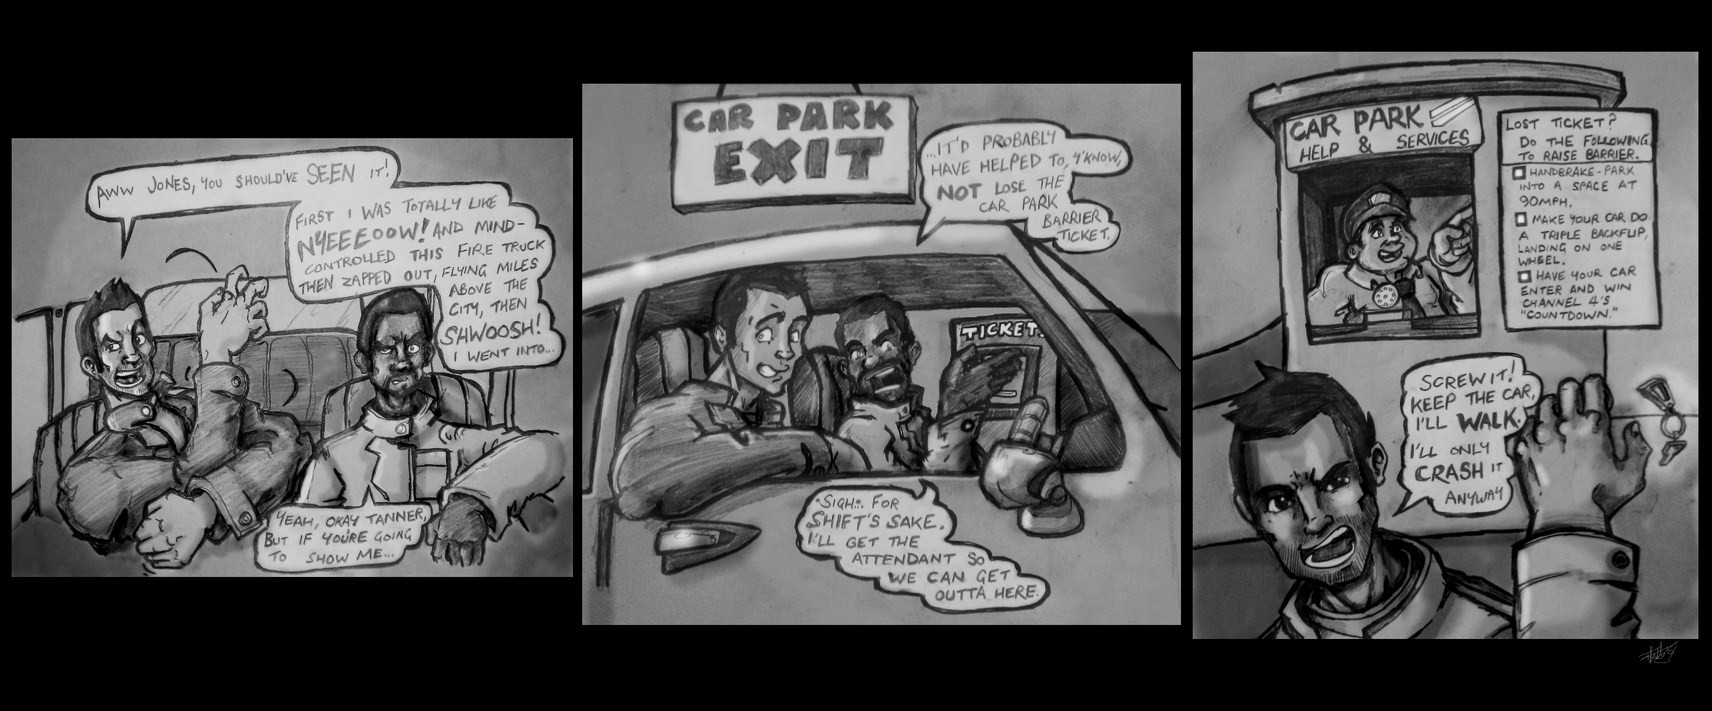 I Never DID Escape that Car Park (Driver)